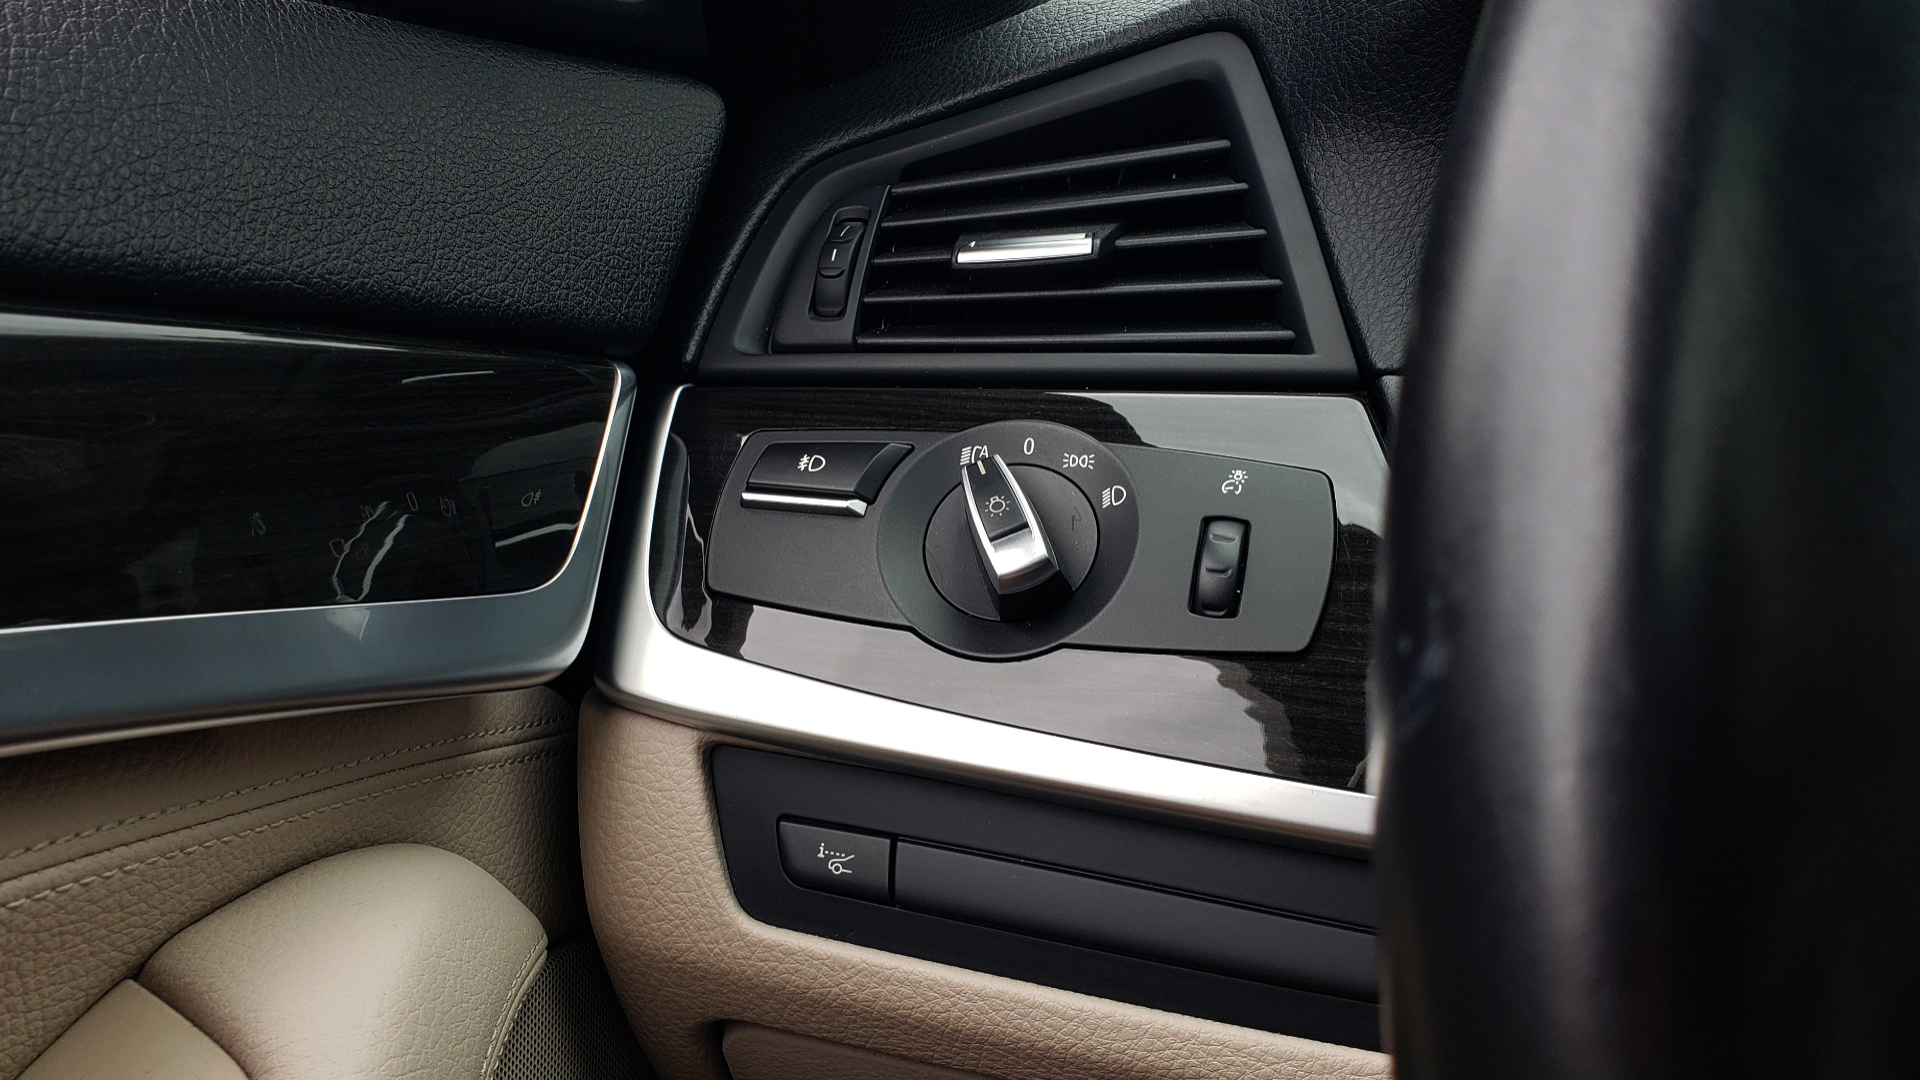 Used 2012 BMW 5 SERIES 550I M SPORT / NAV / CONV PKG / SUNROOF / PREM SND / REARVIEW for sale Sold at Formula Imports in Charlotte NC 28227 35